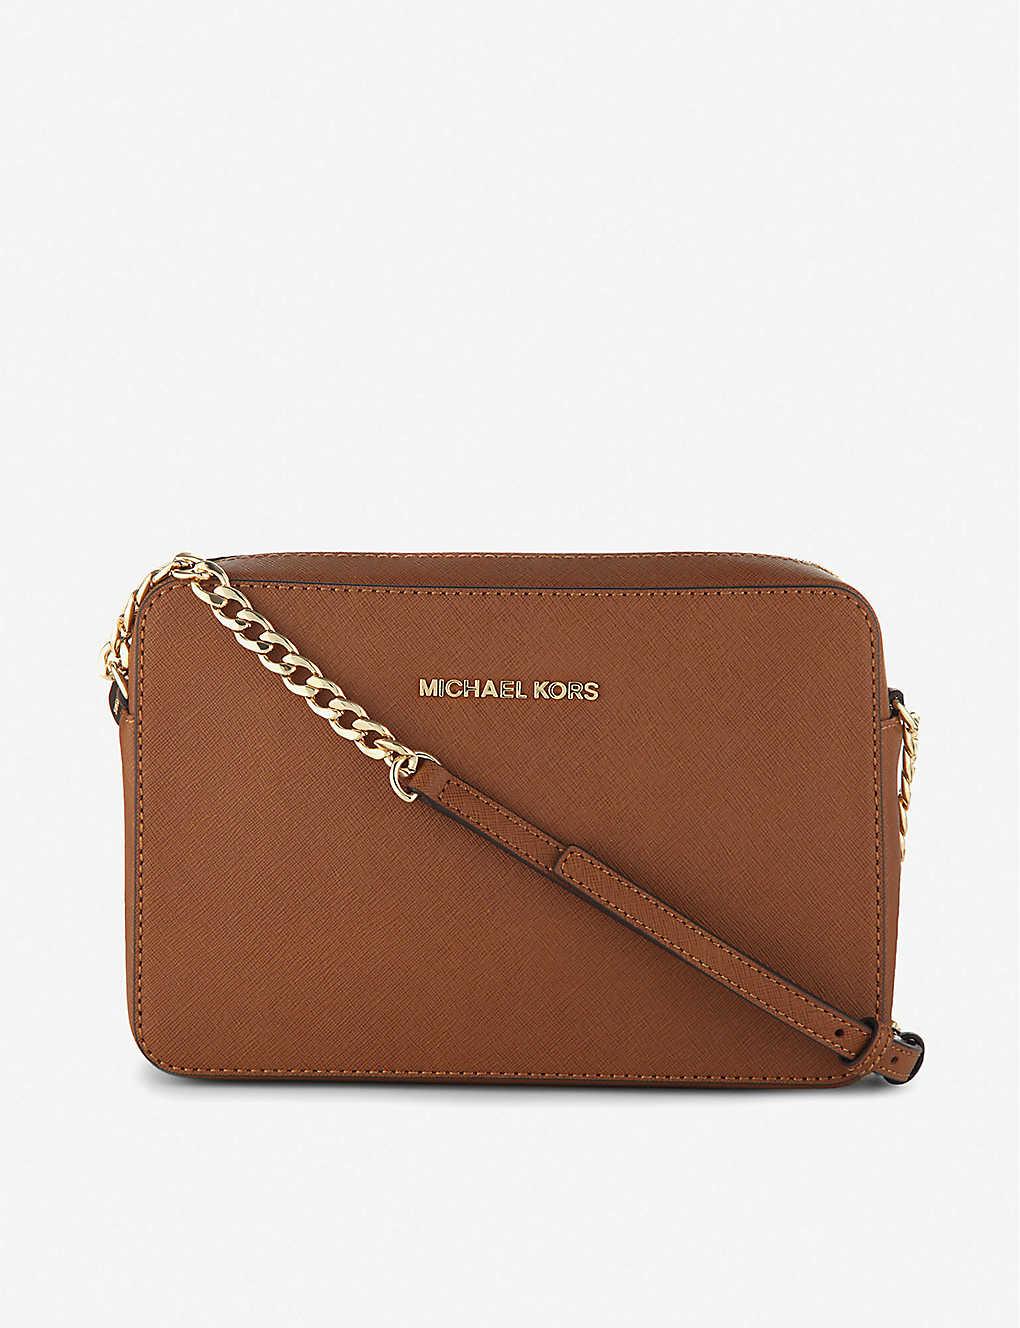 MICHAEL MICHAEL KORS - Saffiano leather cross-body bag  f21b13d0d2c57